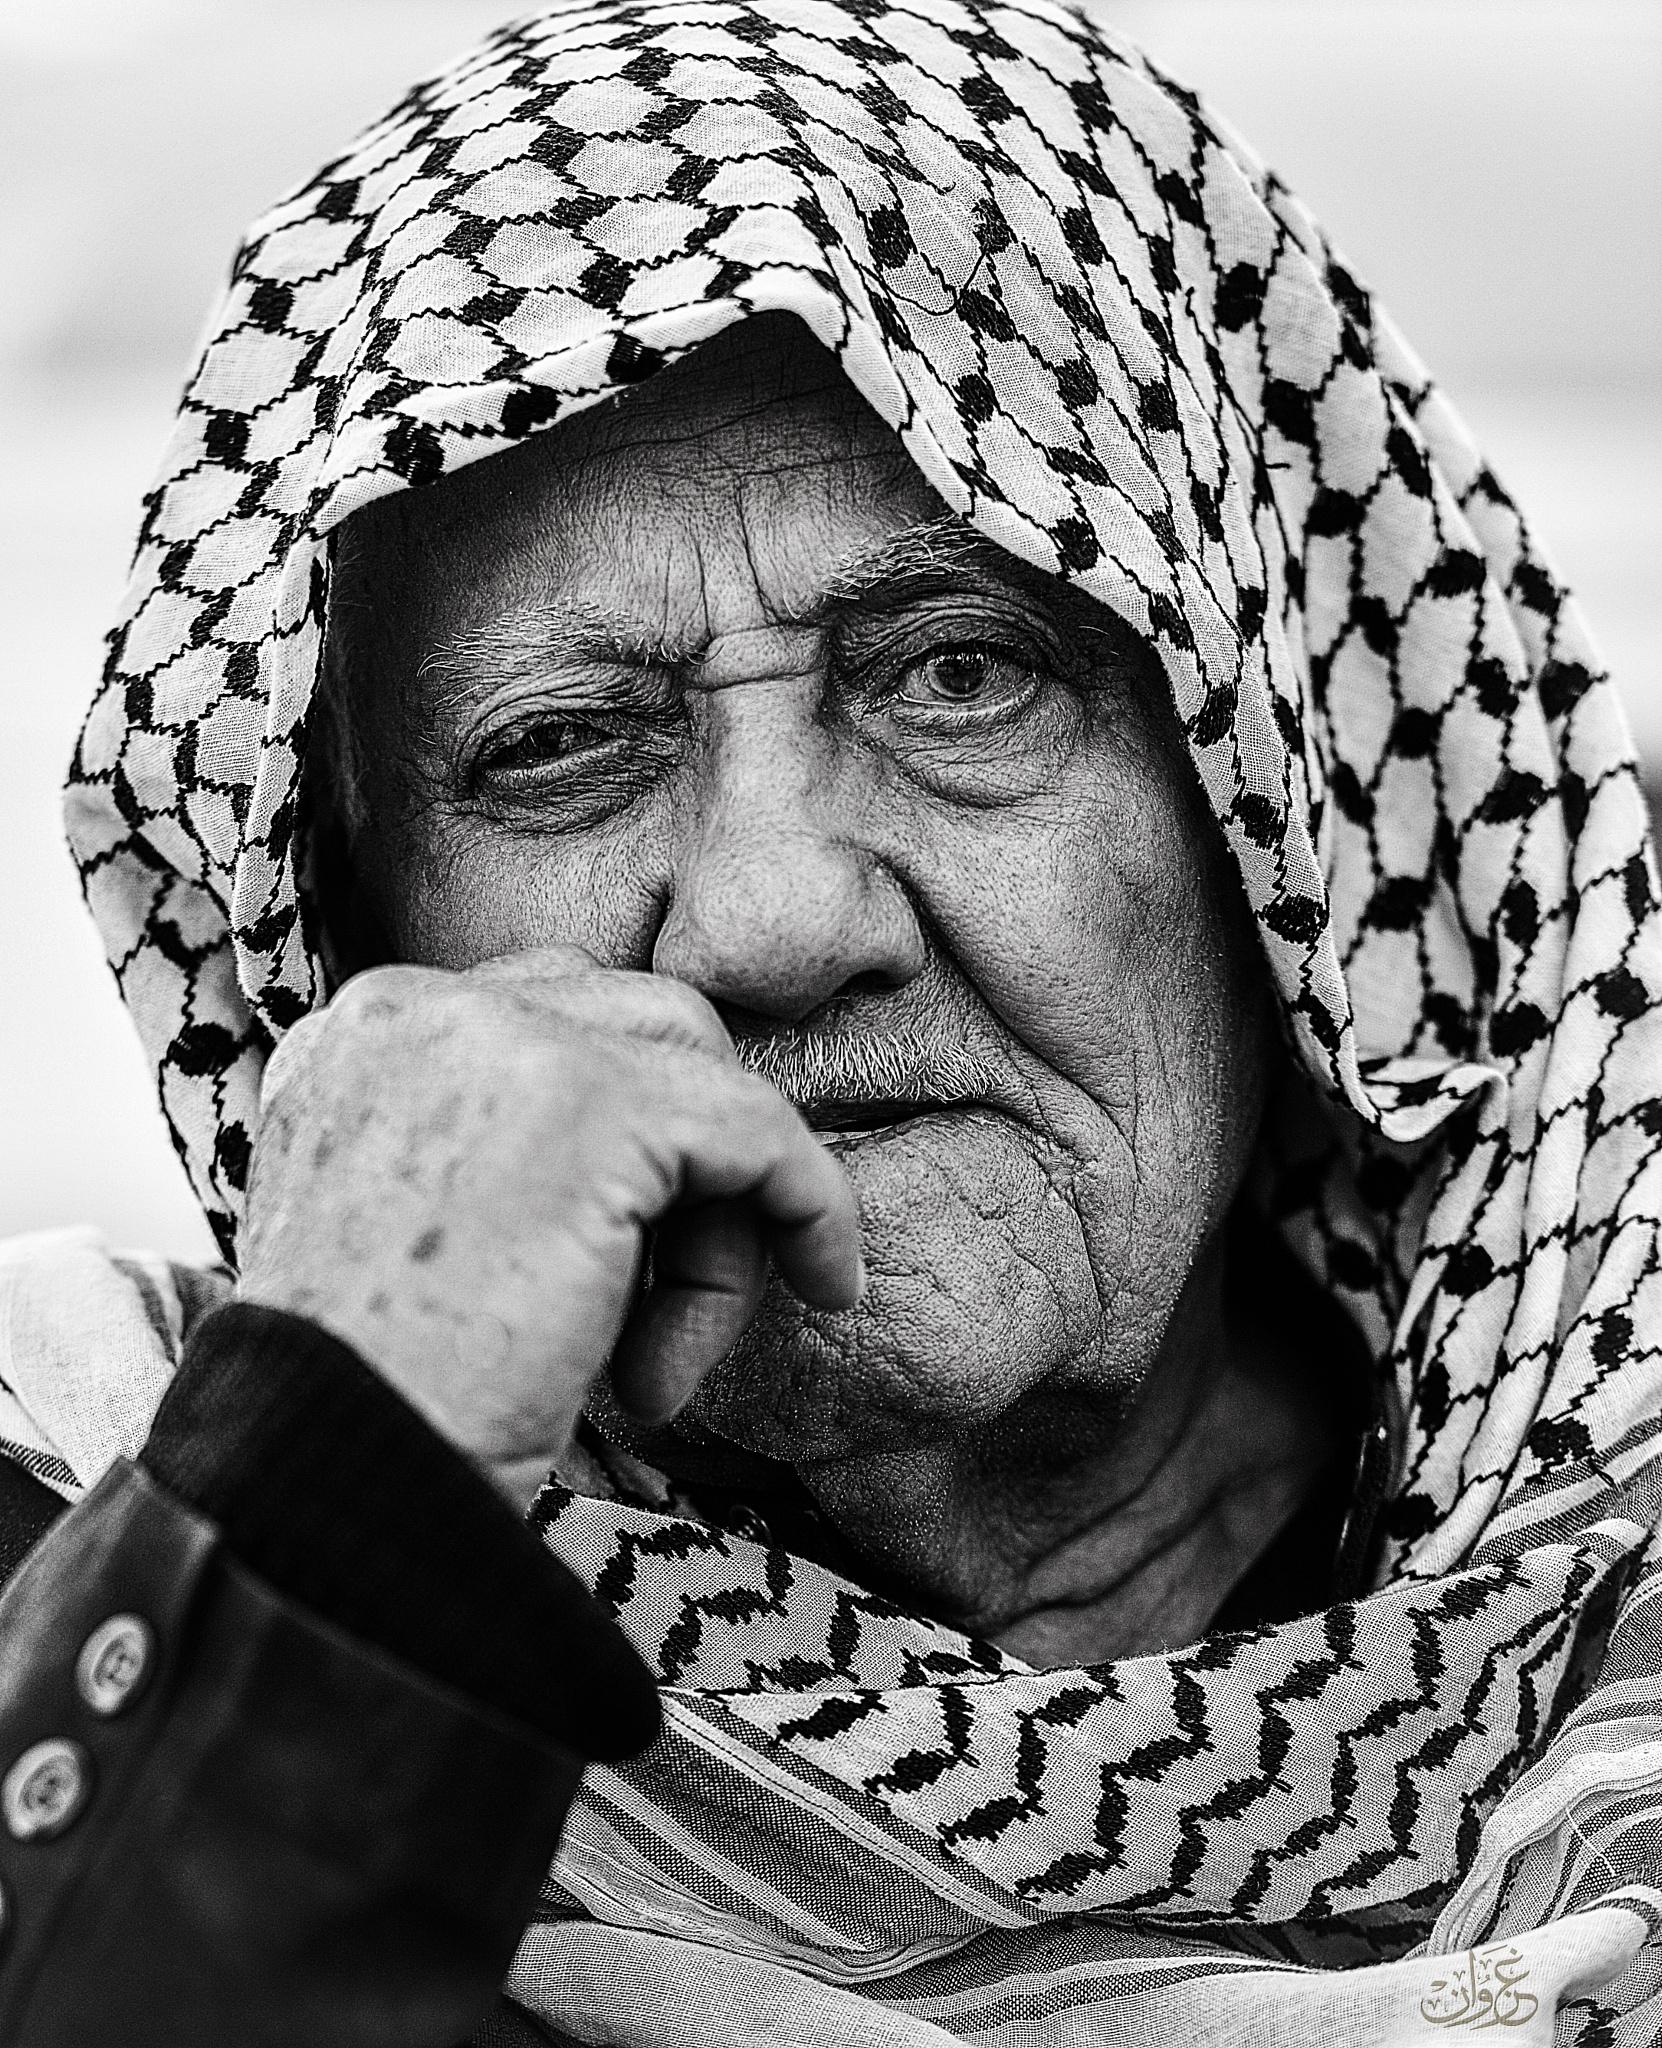 Wisdom by Ghazwan Mahdi photography